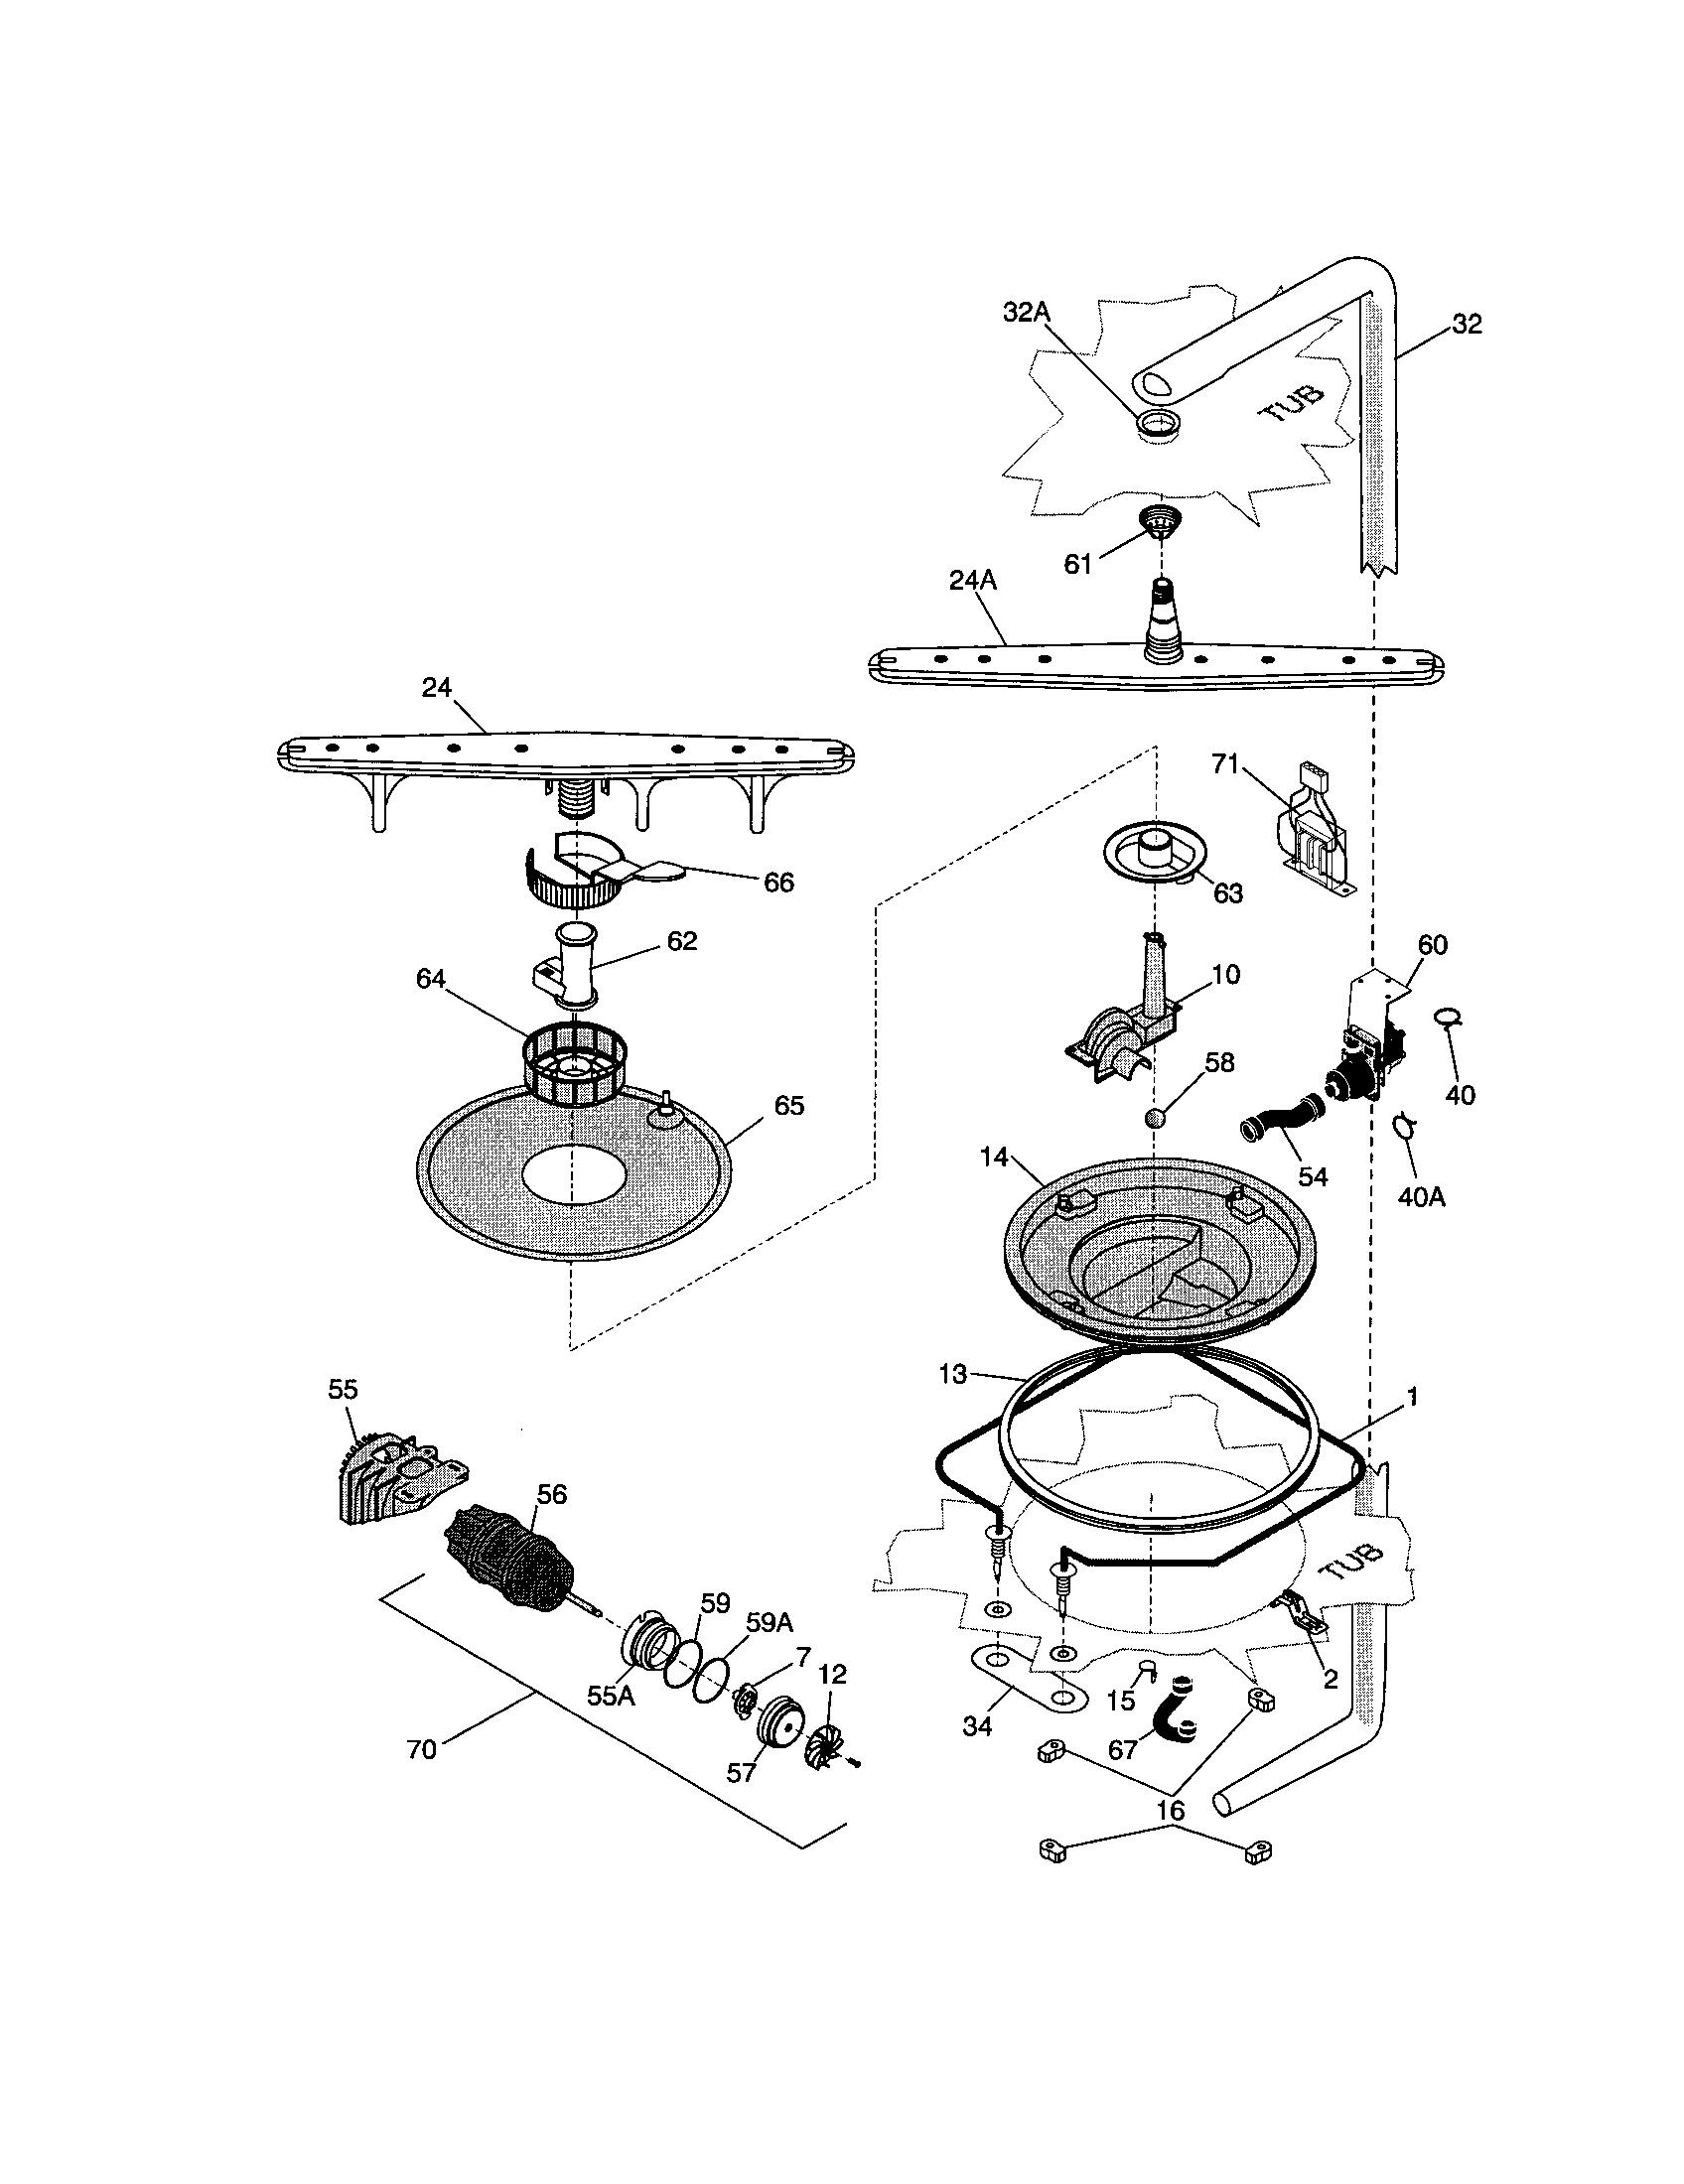 hight resolution of frigidaire fdb989gfw2 motor and pump diagram